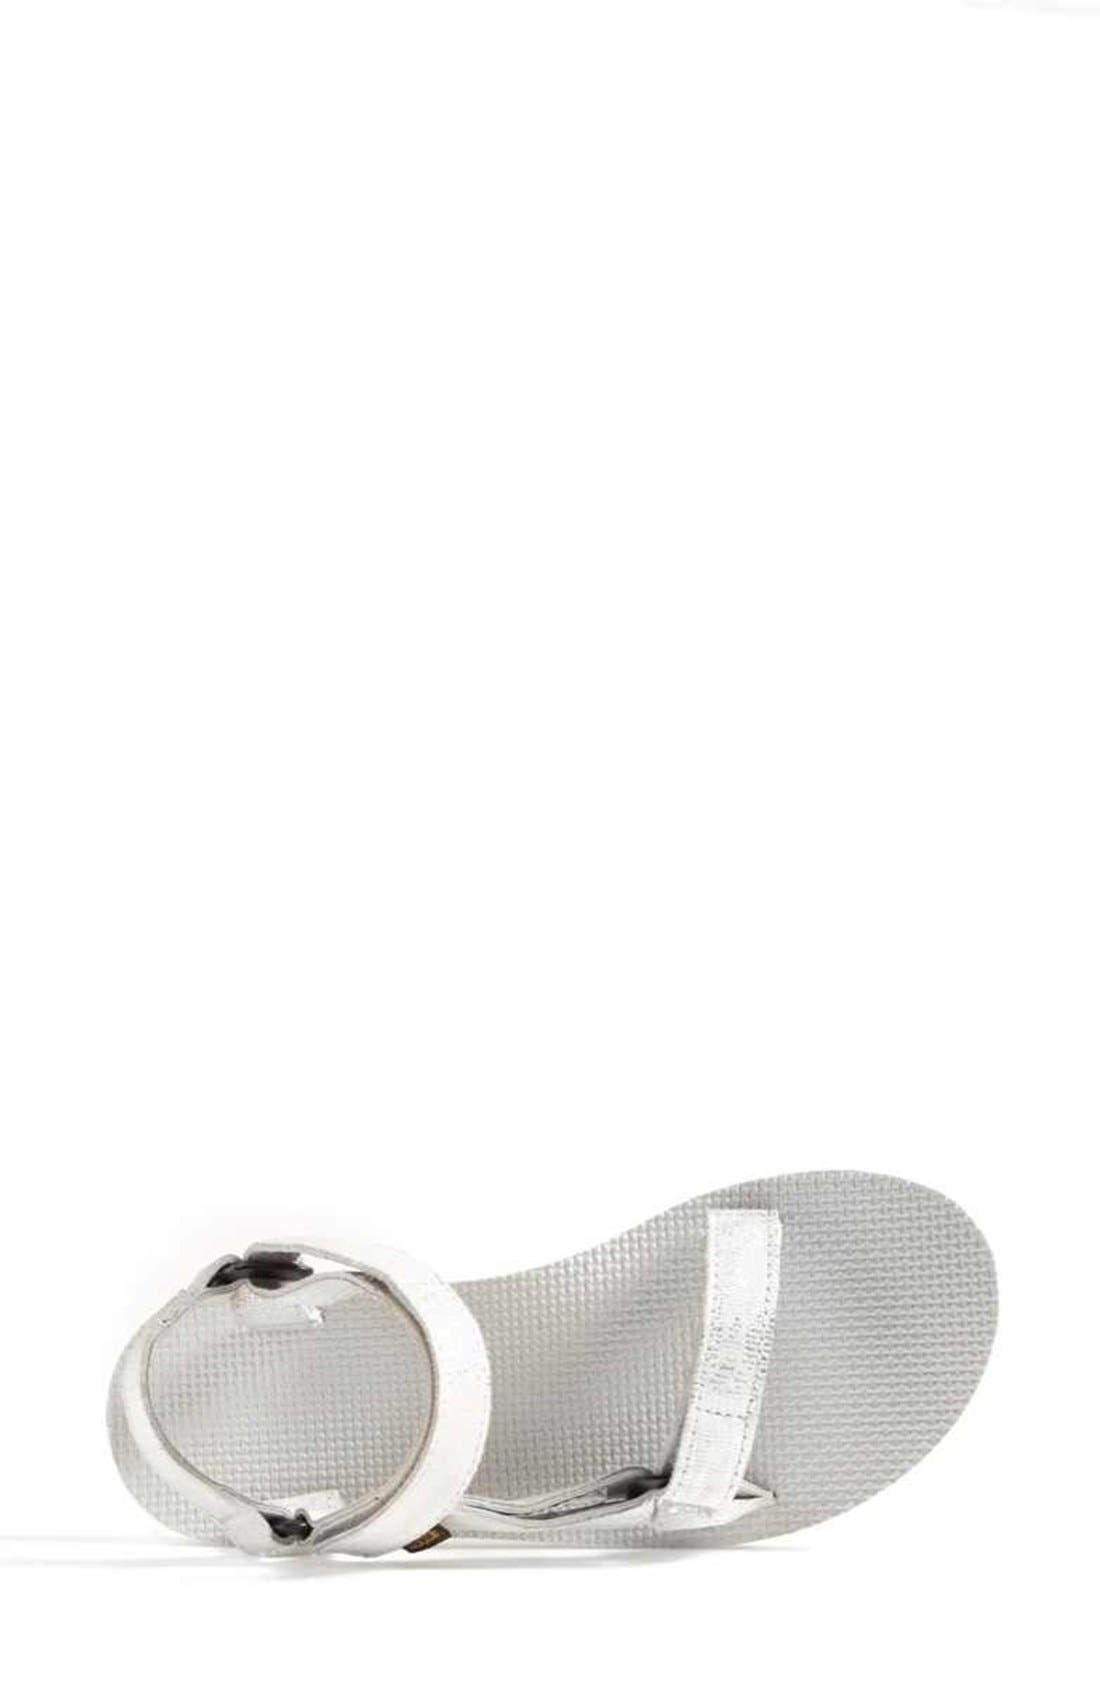 Alternate Image 3  - Teva 'Original Universal' Sandal (Nordstrom Exclusive) (Women)